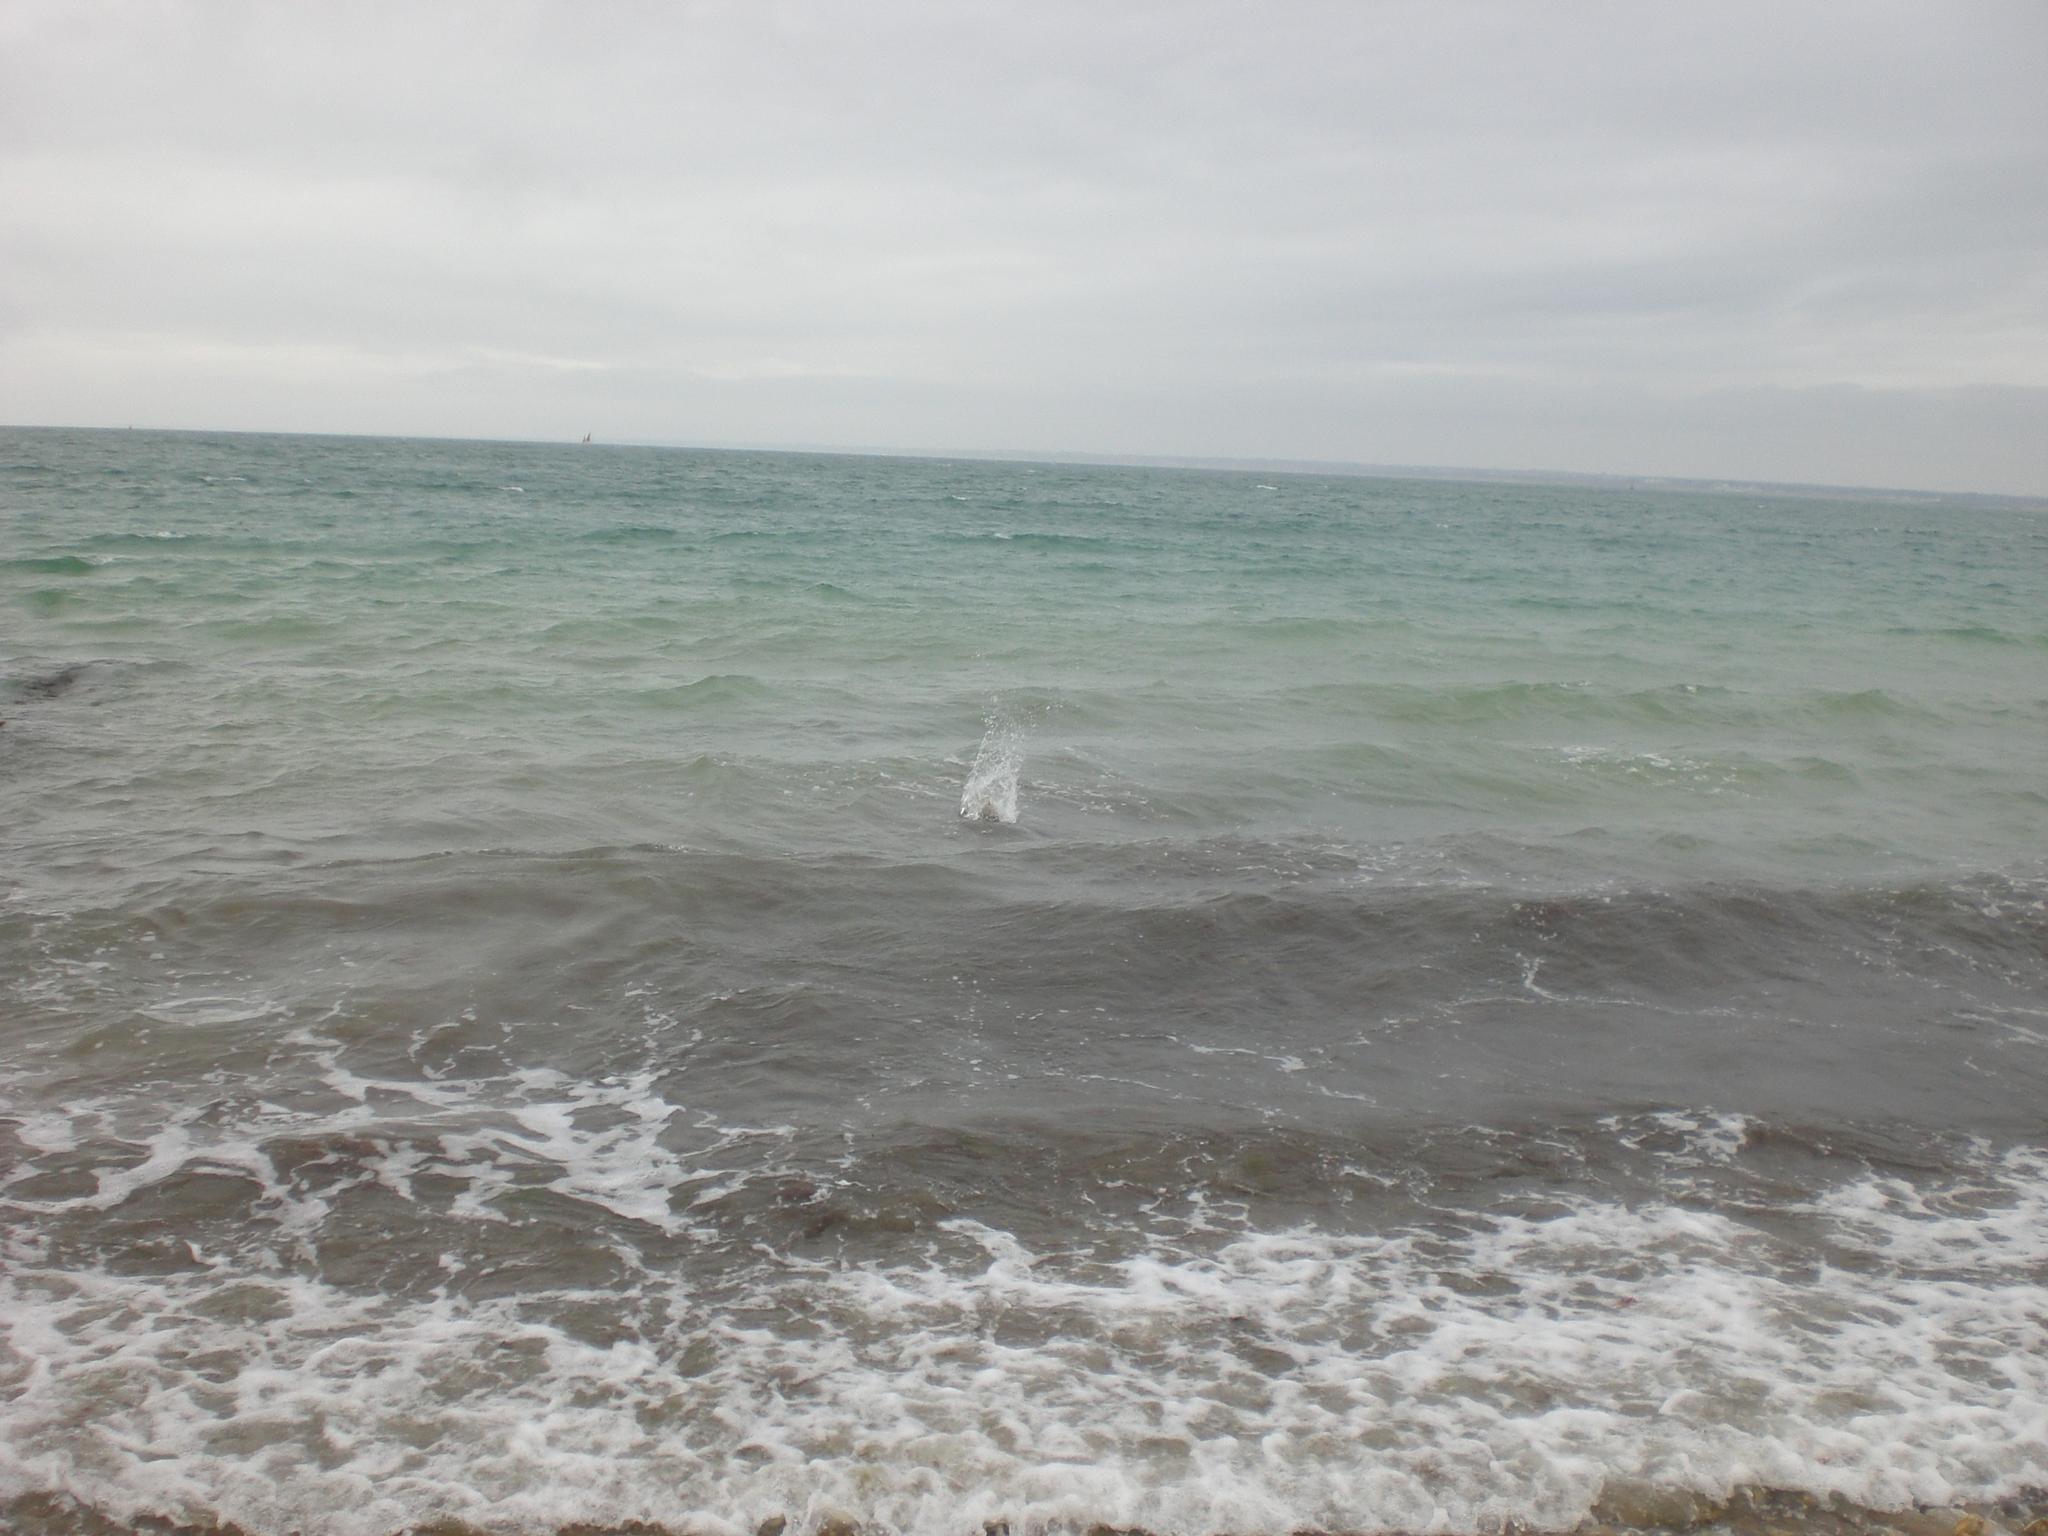 Just a splash in the sea by Jan.ohnokt